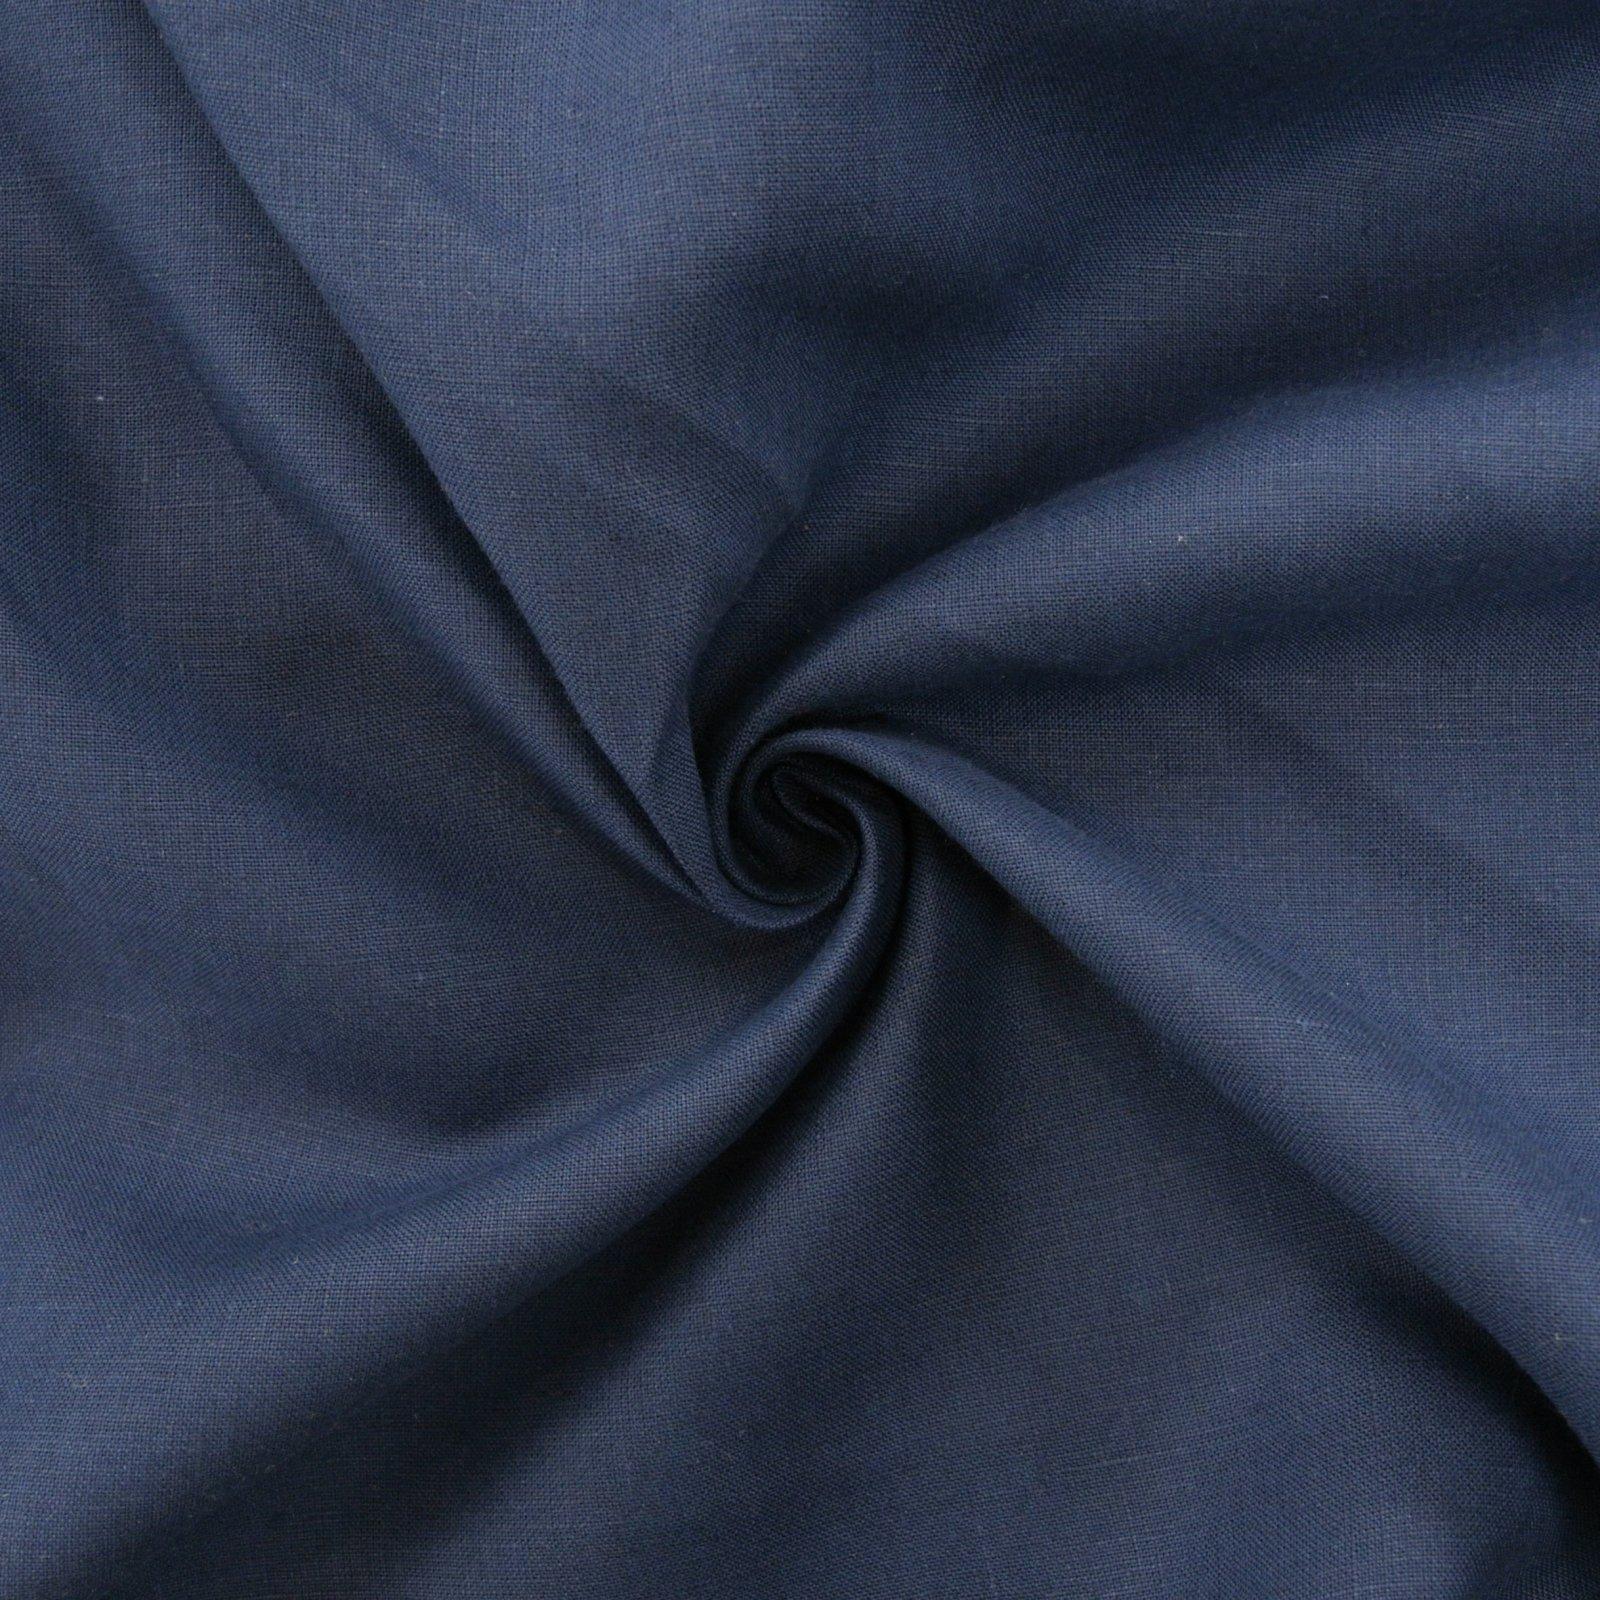 Formenti Linen Mid Wt new indigo